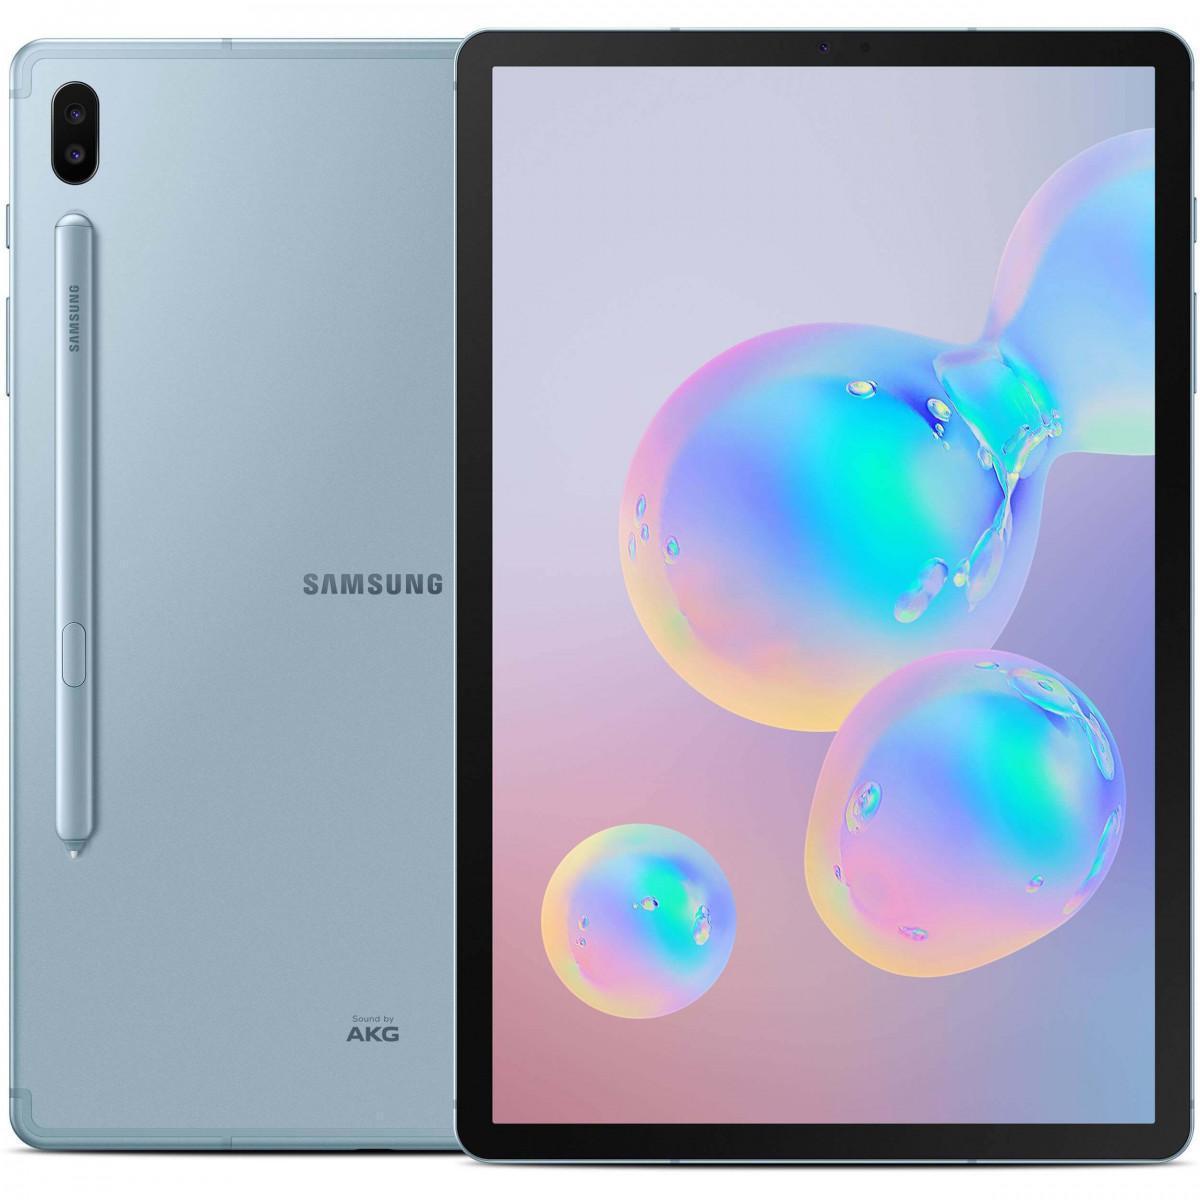 Samsung объявила о старте продаж планшета Galaxy Tab S6 5G (2019 12 26 image 21)